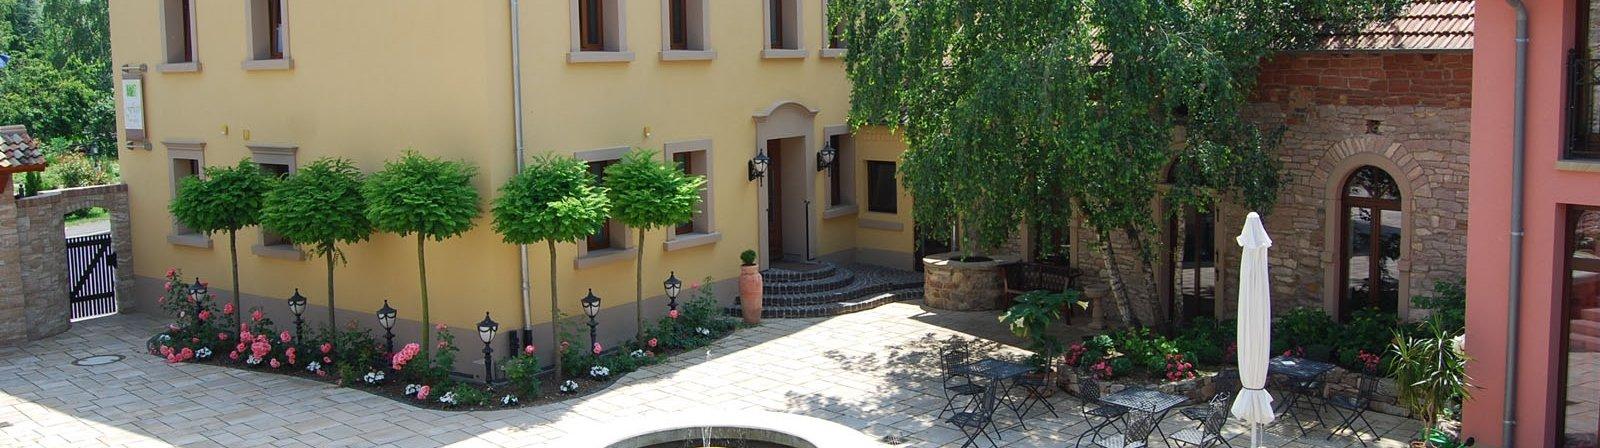 Bad Kreuznach Hotel